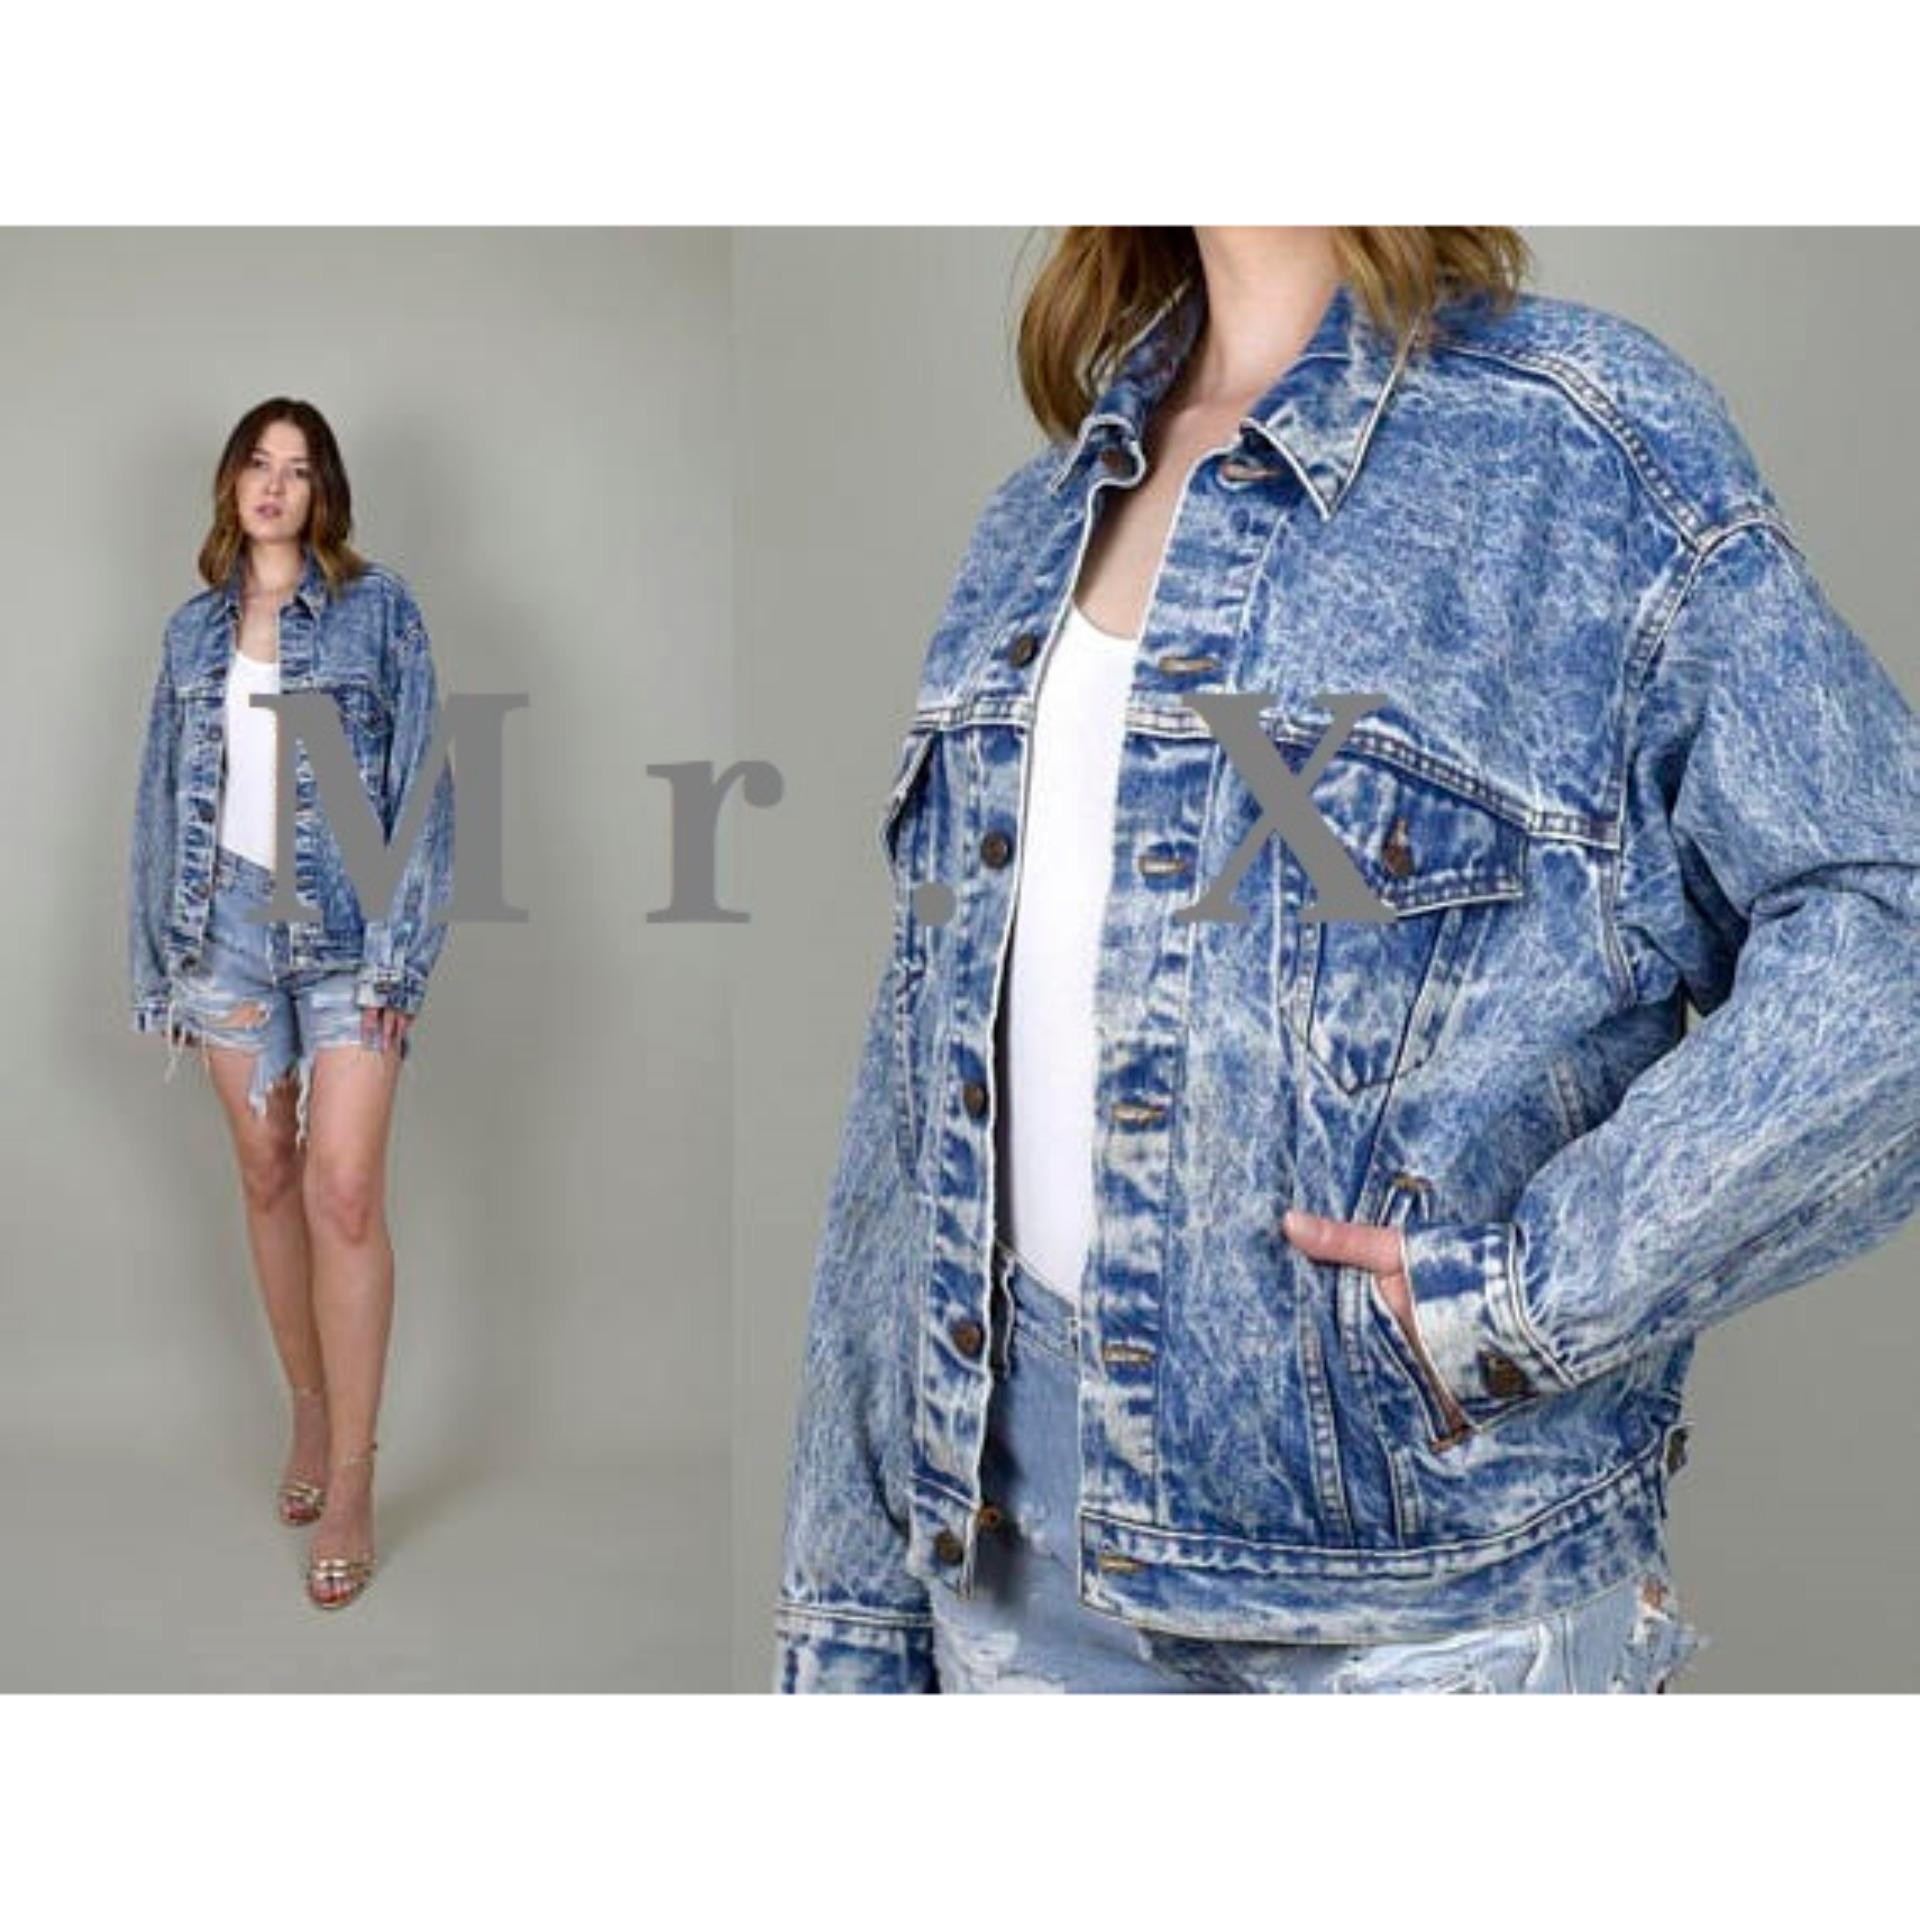 Harga Jaket Jeans Denim Oversize Wanita Blue Acidwash Biru Serpihan Putih Premium Quality By Mr X Terbaik